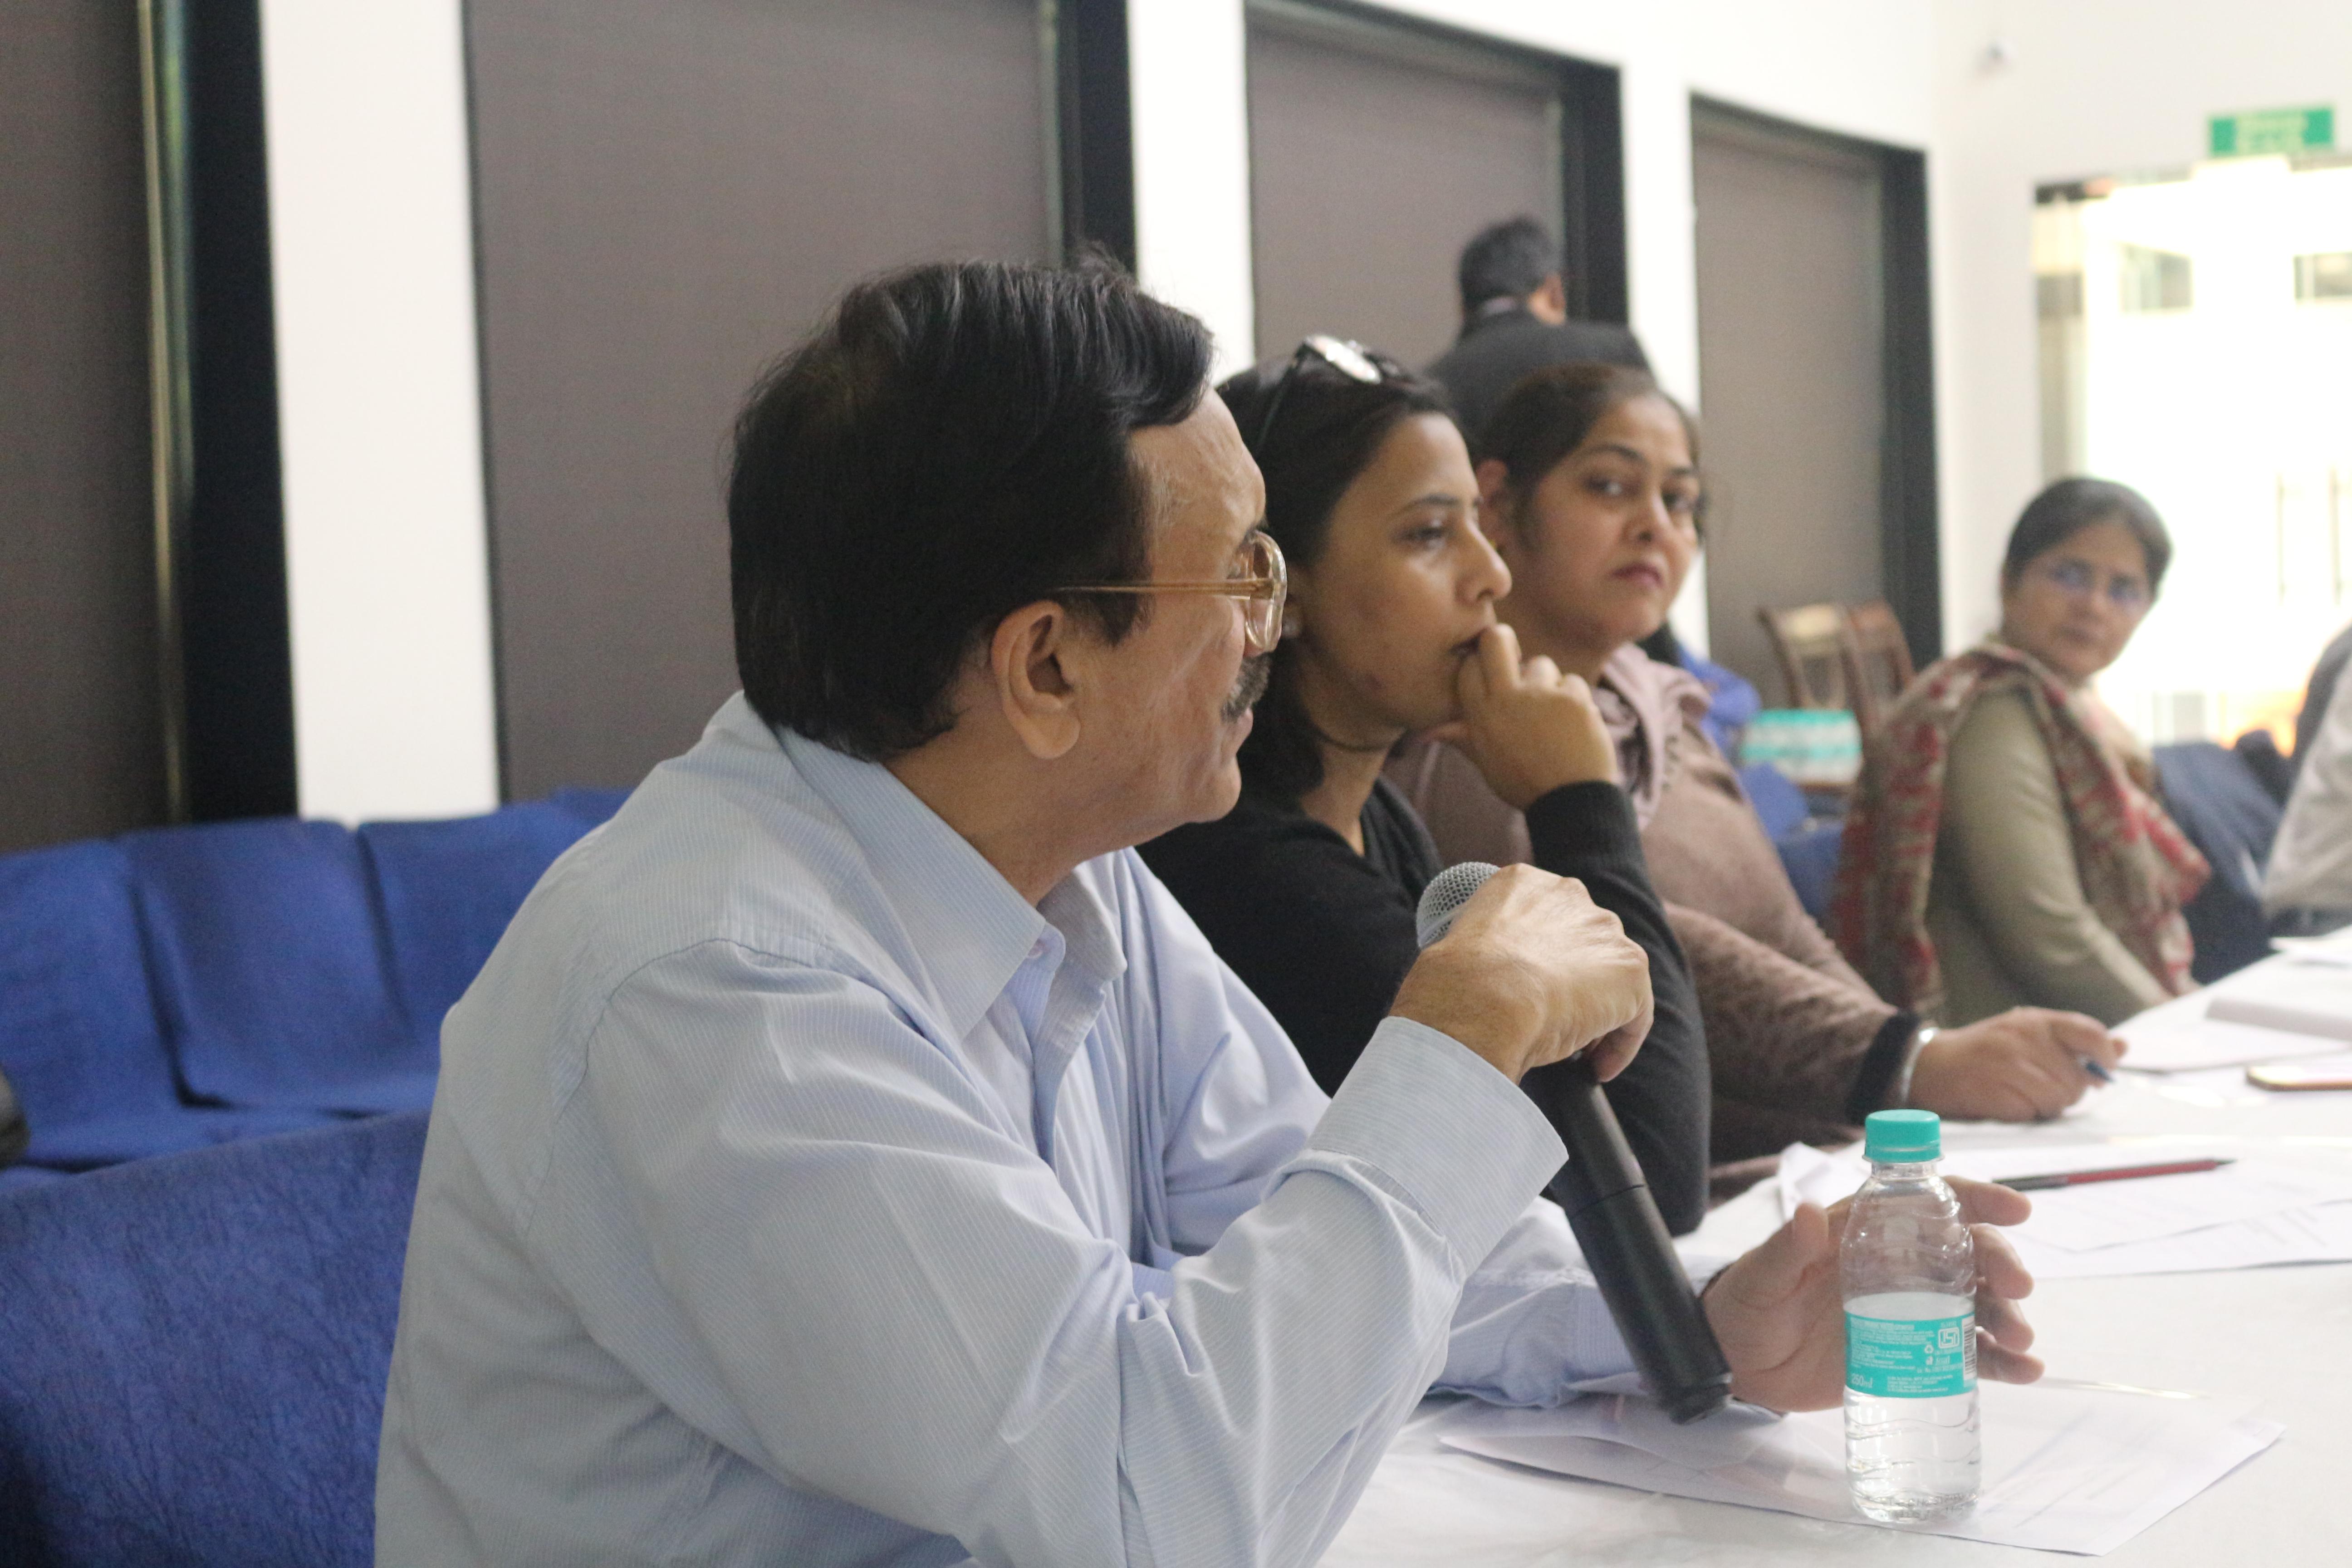 Mr. Rajive Raturi, Director, DRI, HRLN speaking